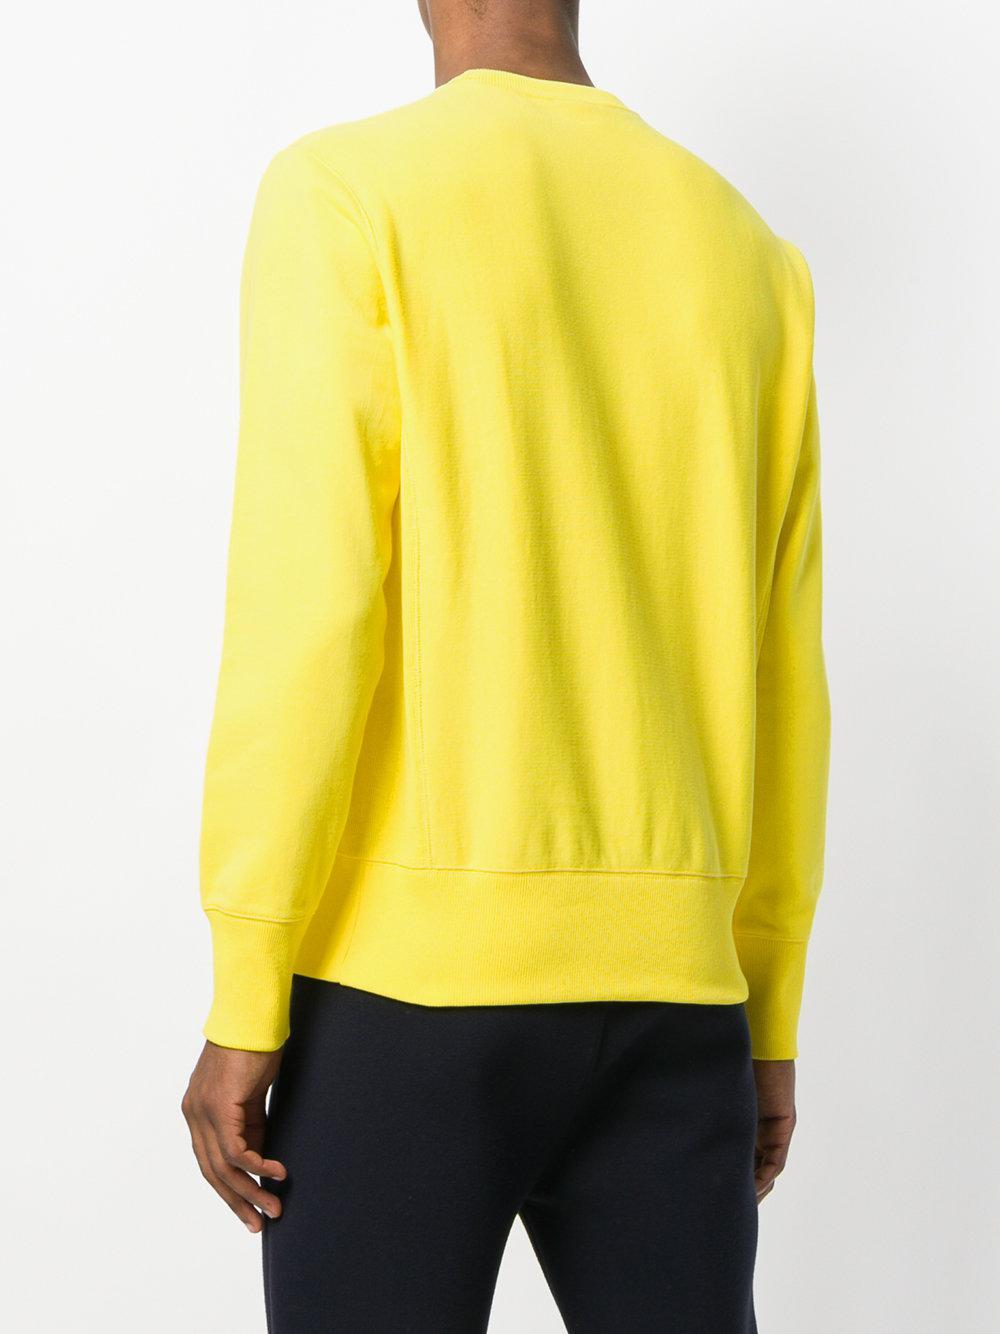 Champion Cotton Reverse Weave Crewneck Sweatshirt in Yellow & Orange (Yellow) for Men